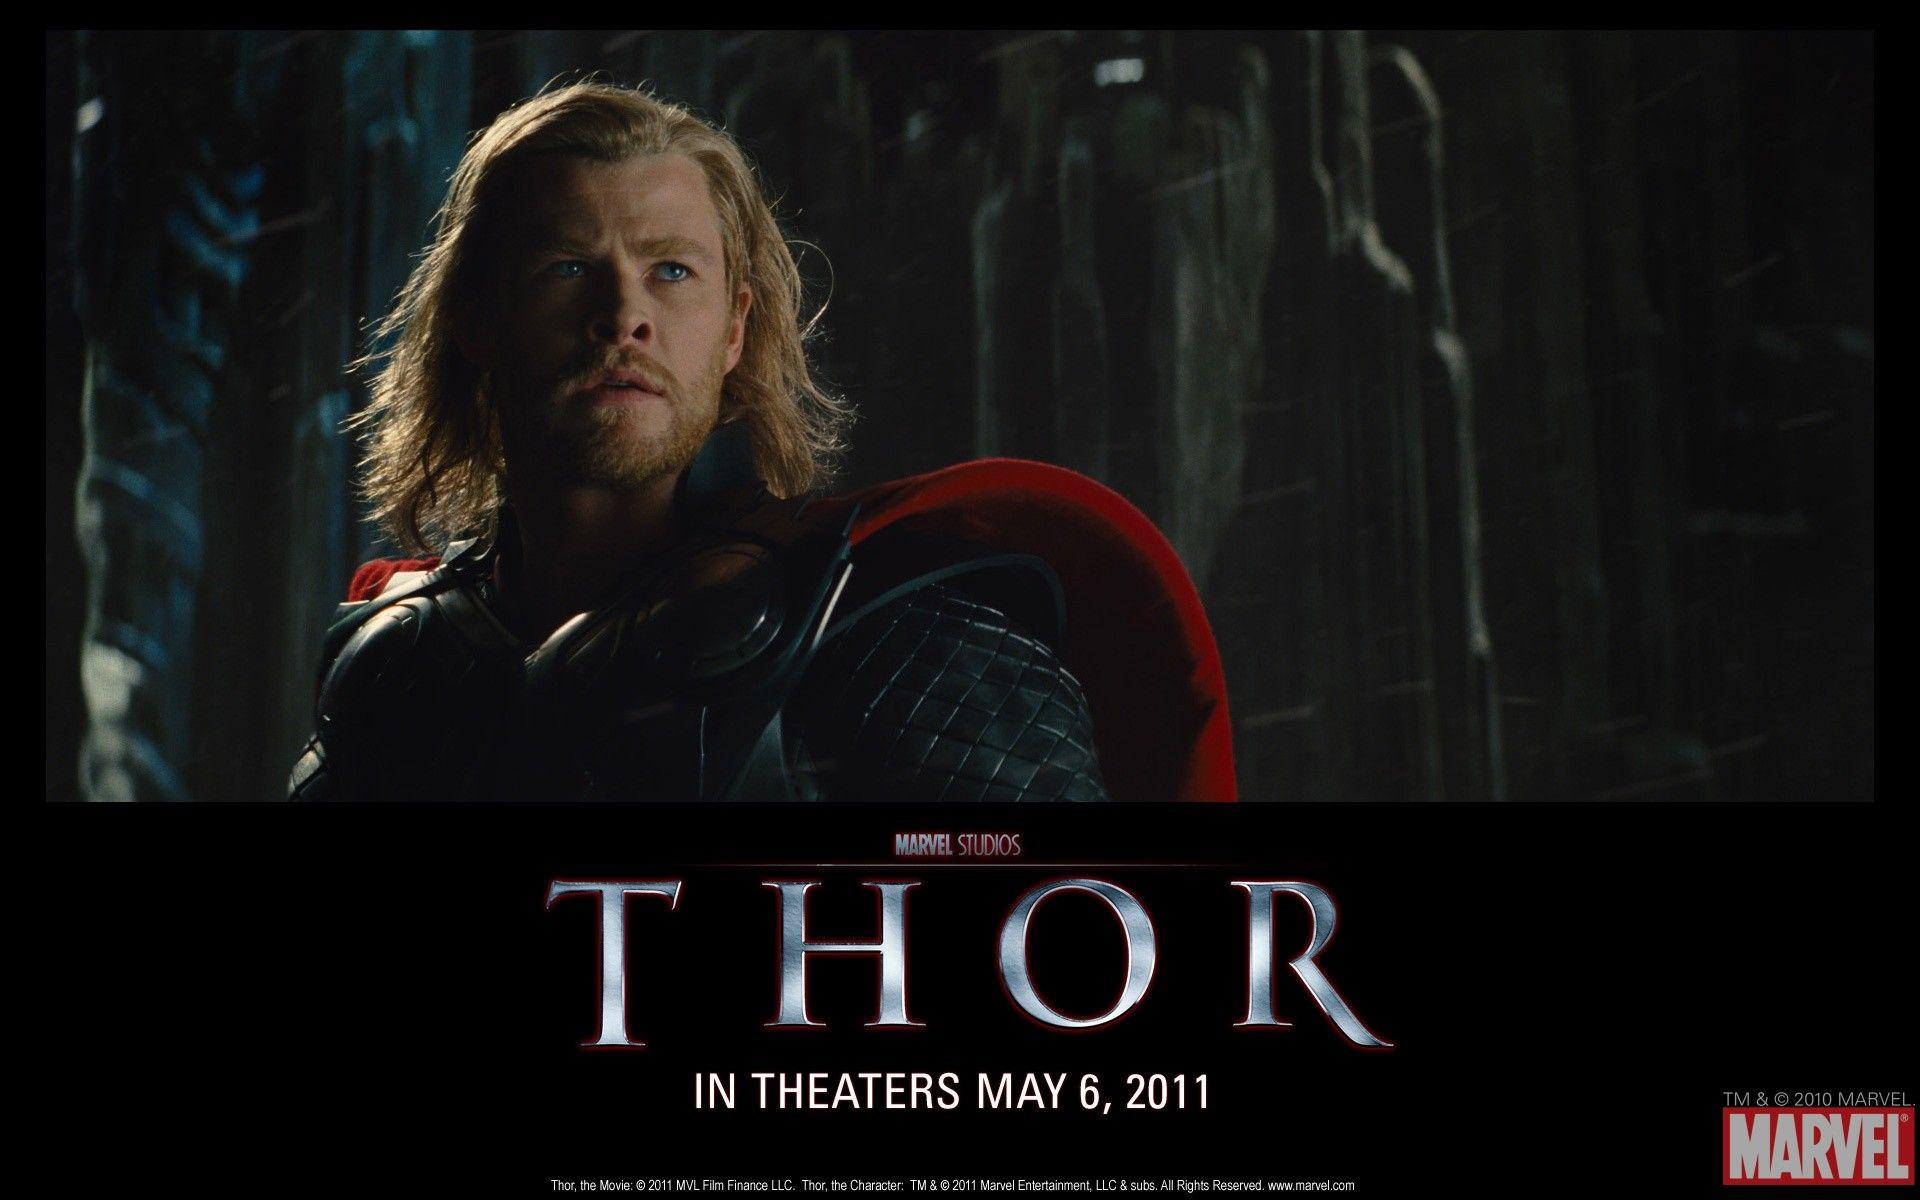 Thor Movie Wallpaper 6 Movie Wallpapers Marvel Wallpaper Thor Wallpaper